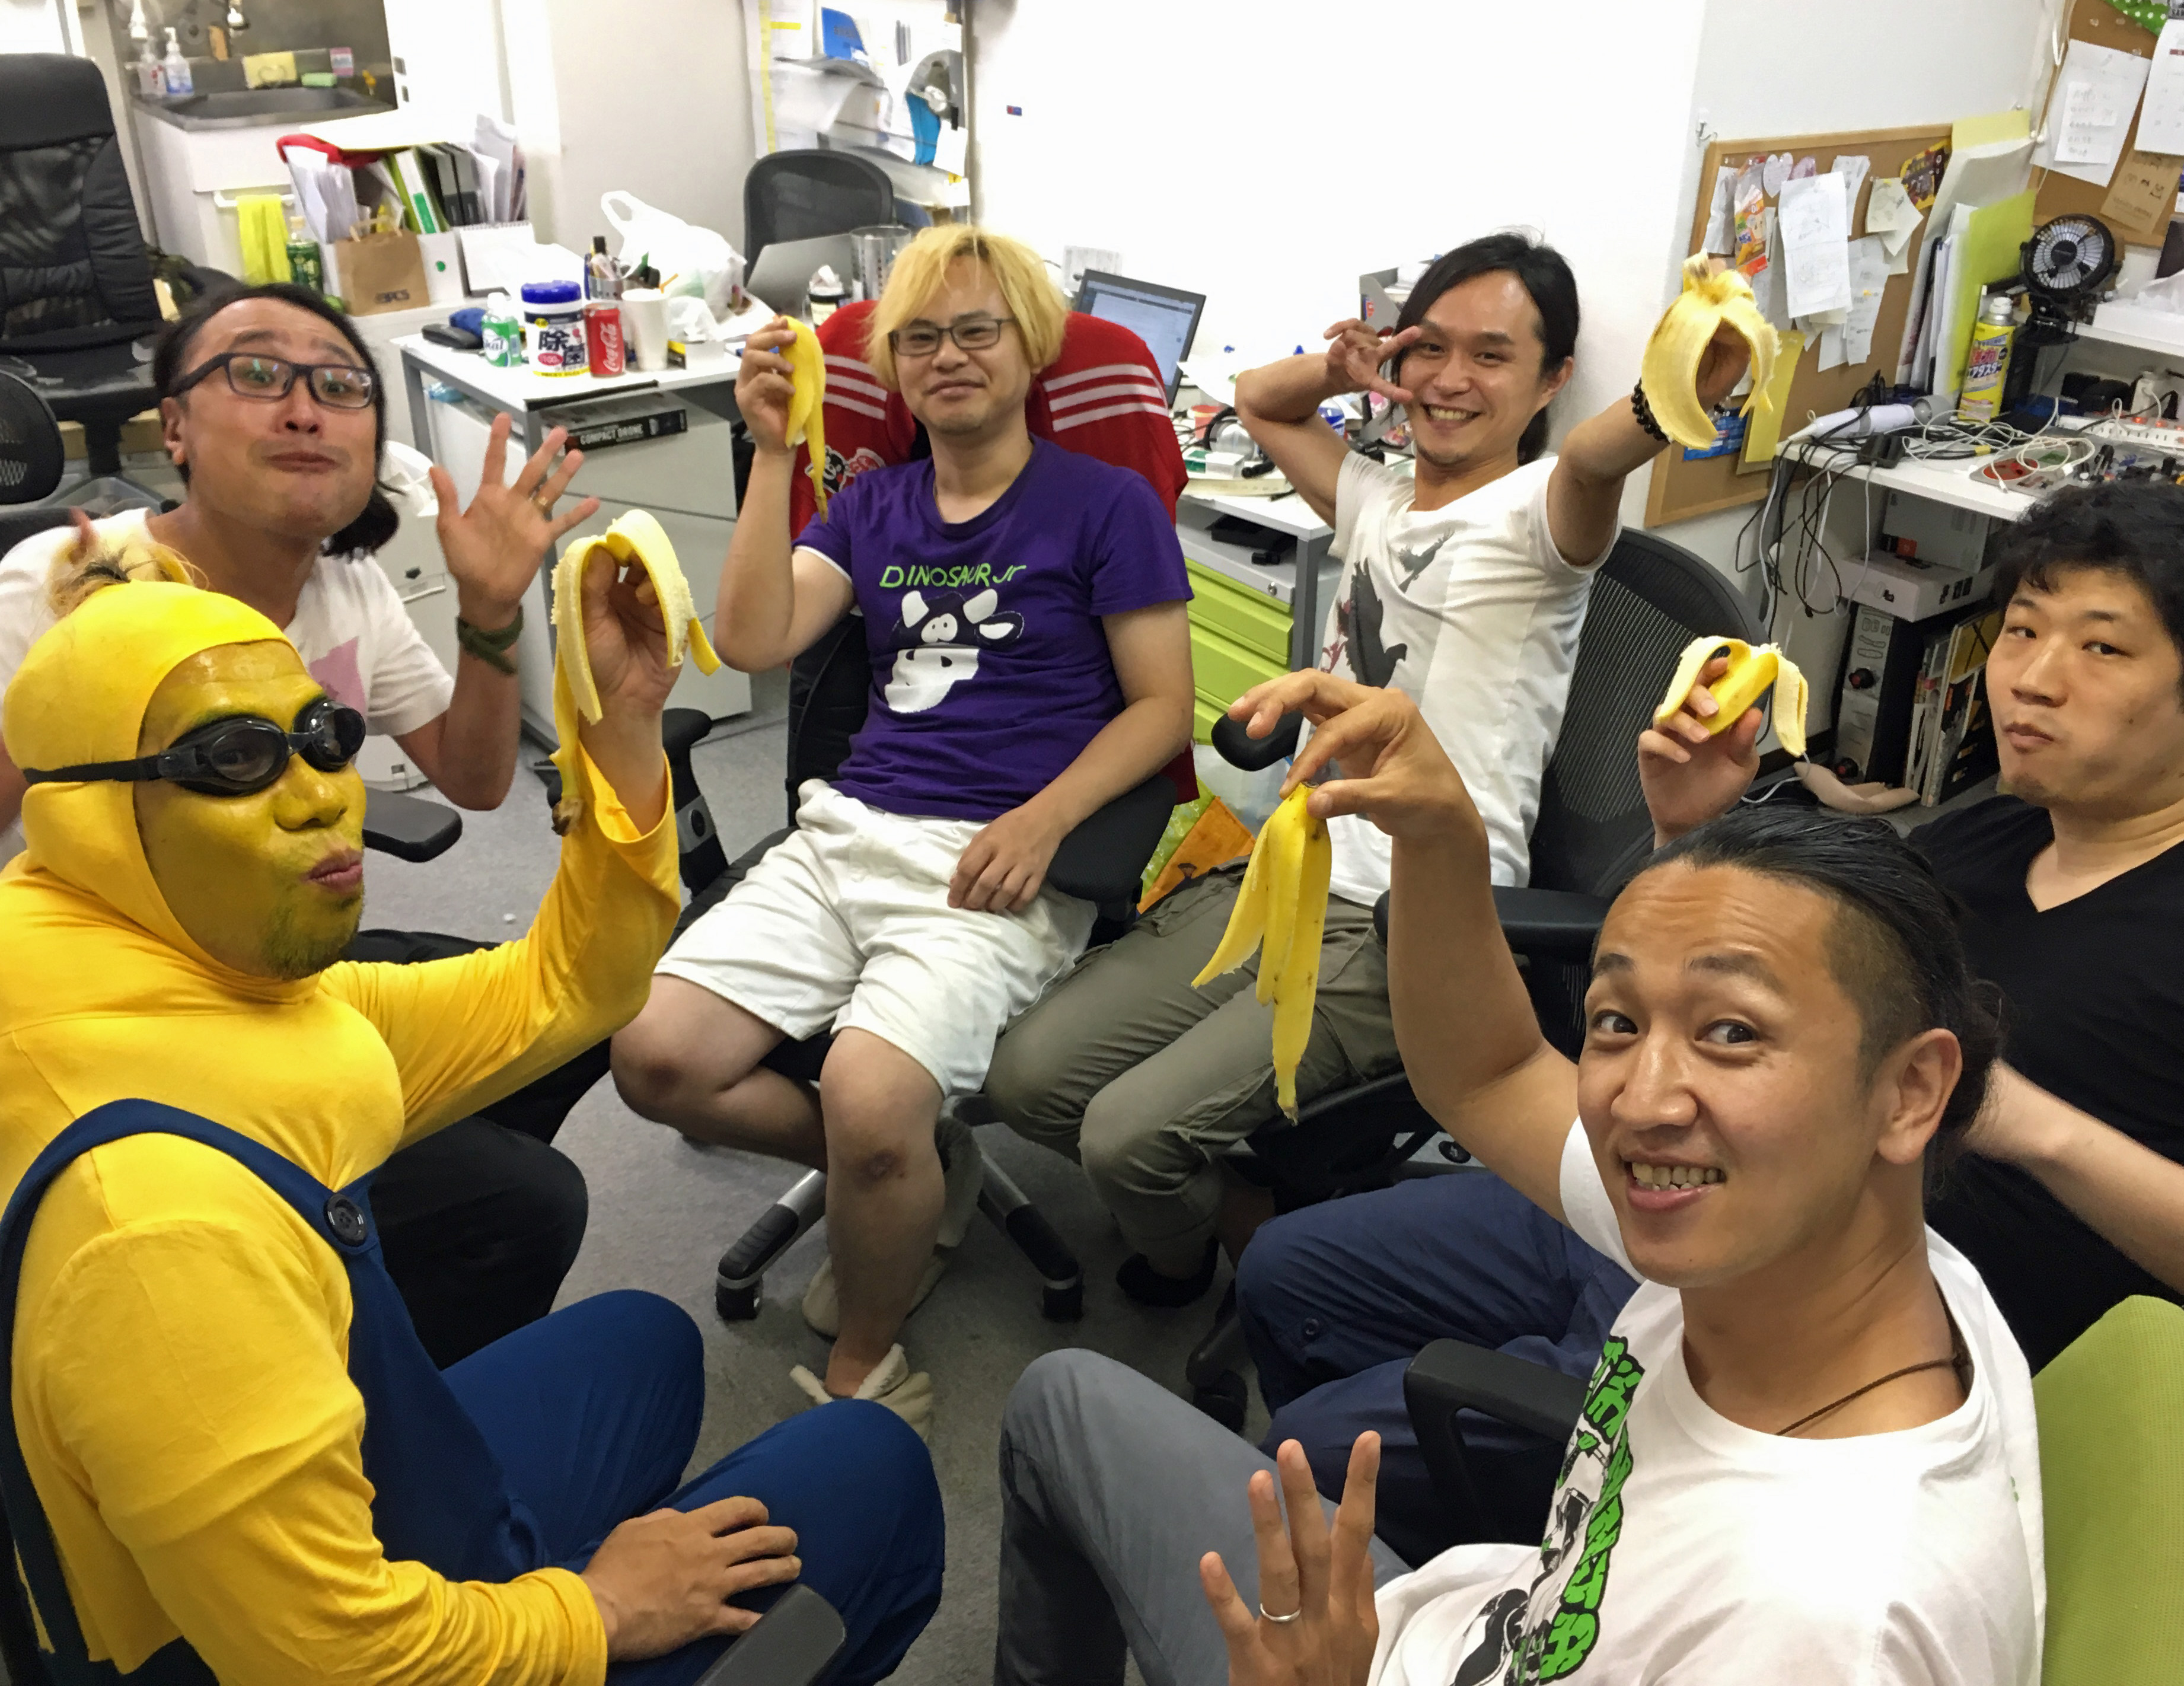 bananam28